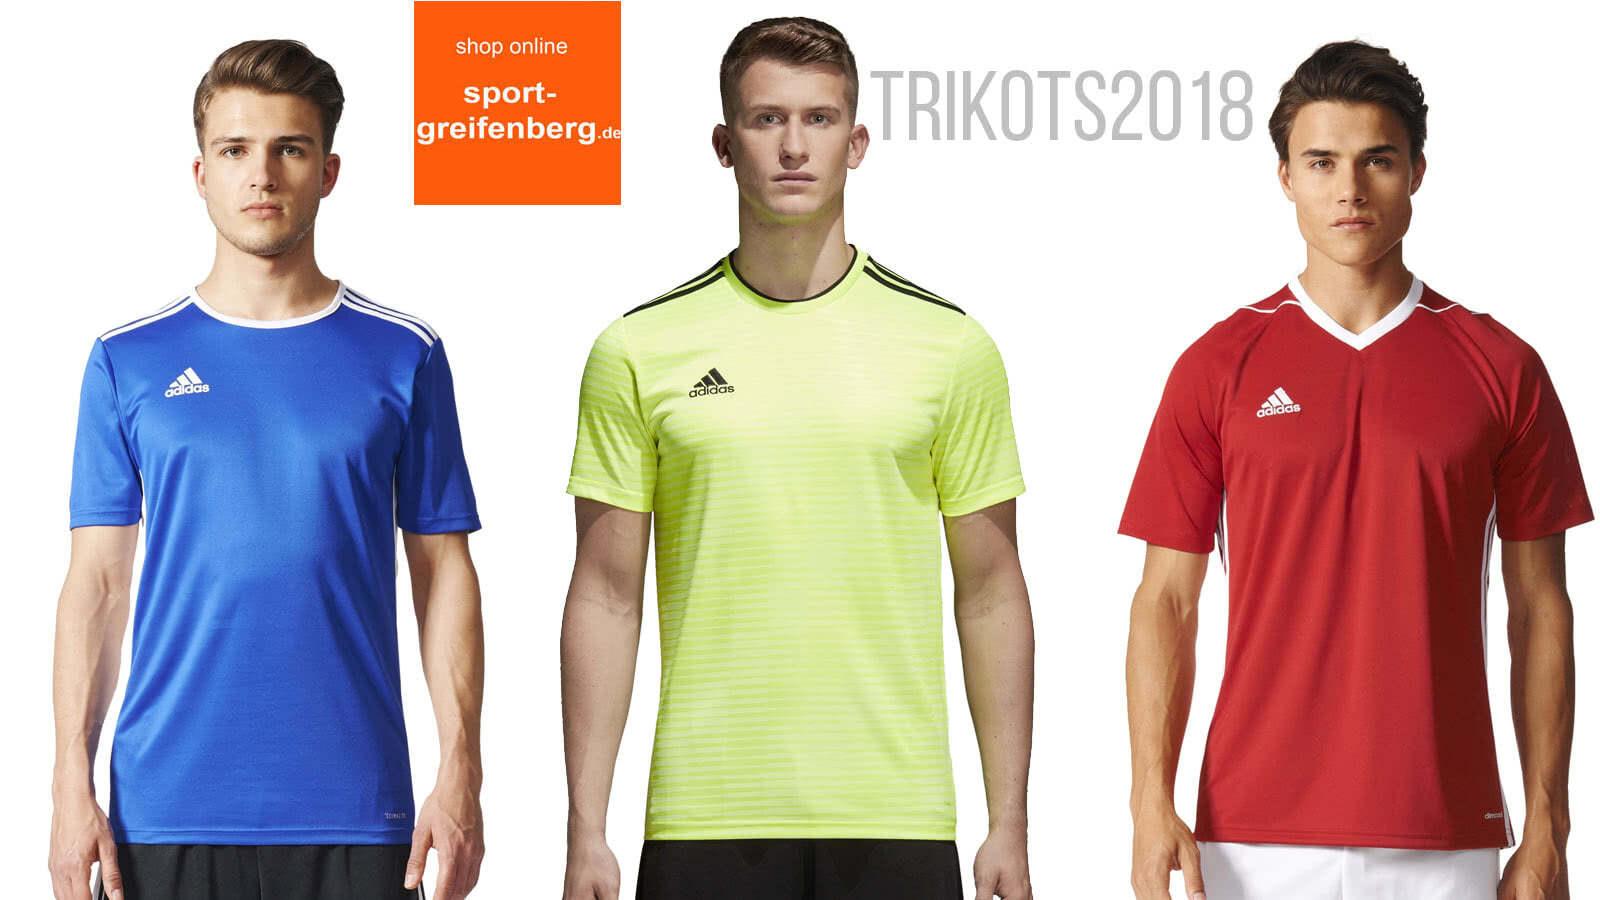 Adidas Trikots 2018 2019 Alle Trikots Fussball Katalog